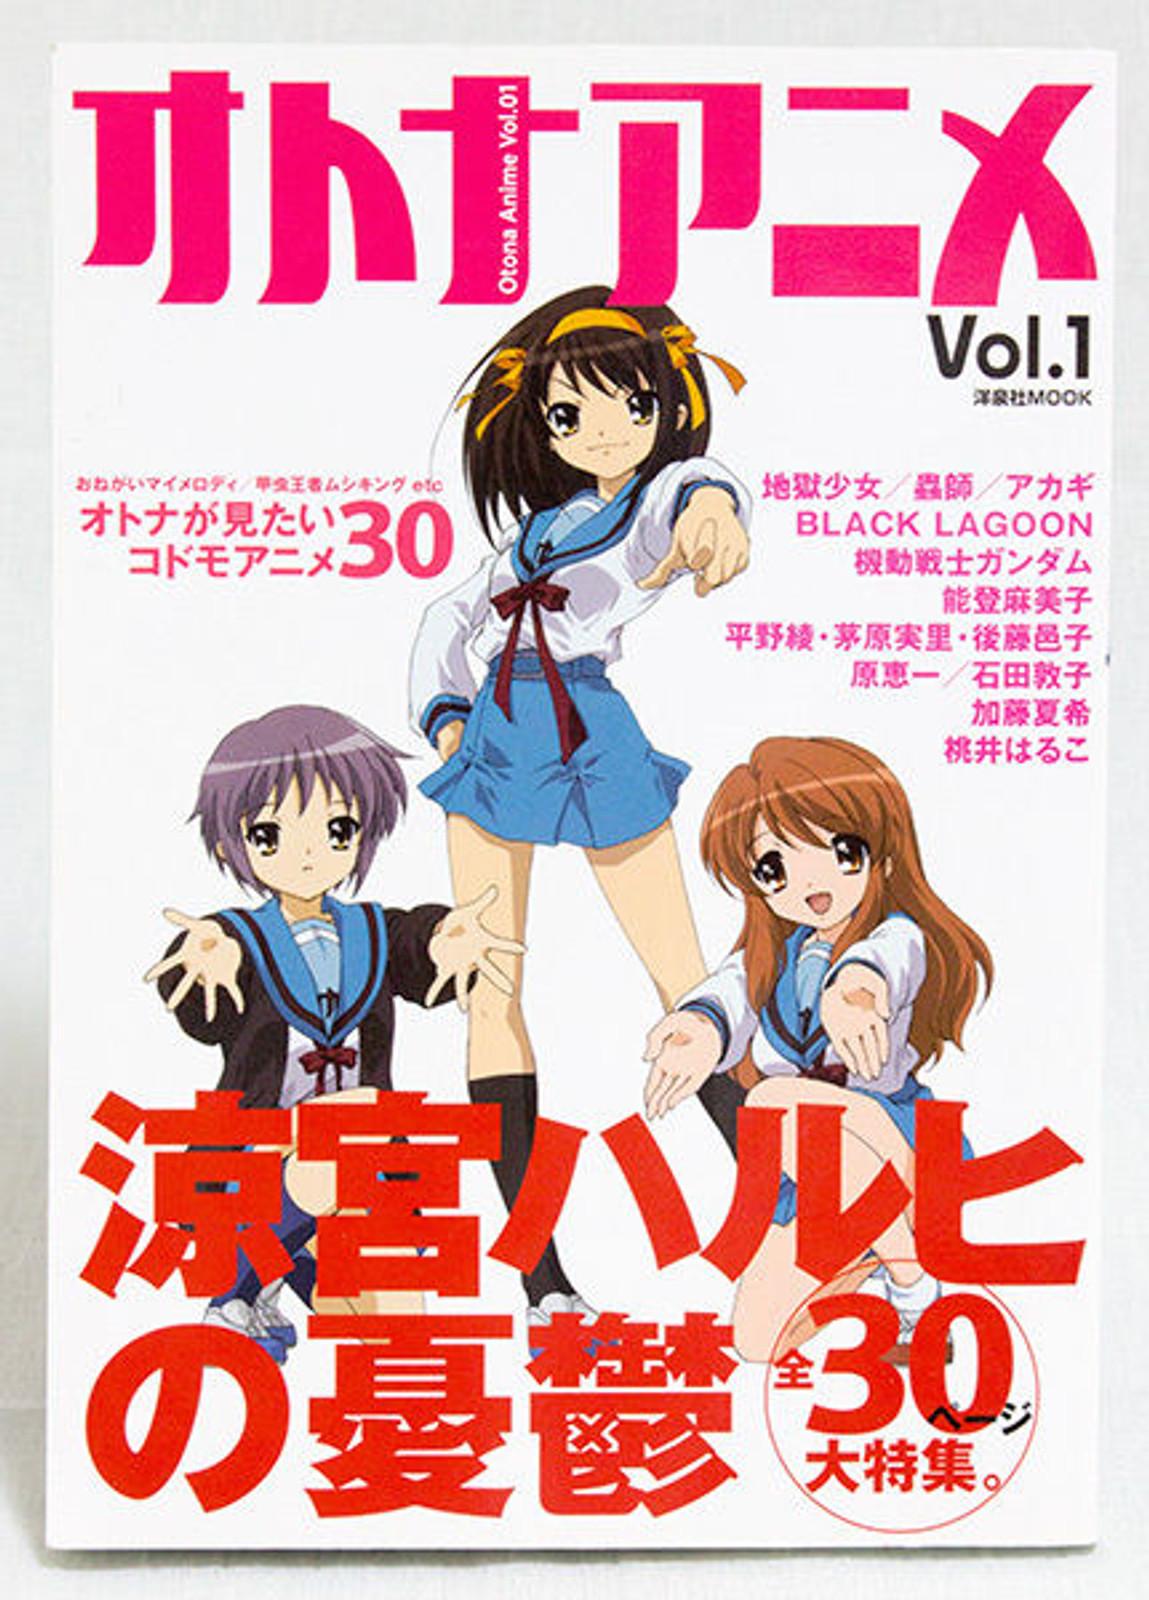 vol.04 JAPAN Magazine Evangelion Chronicle New Edition